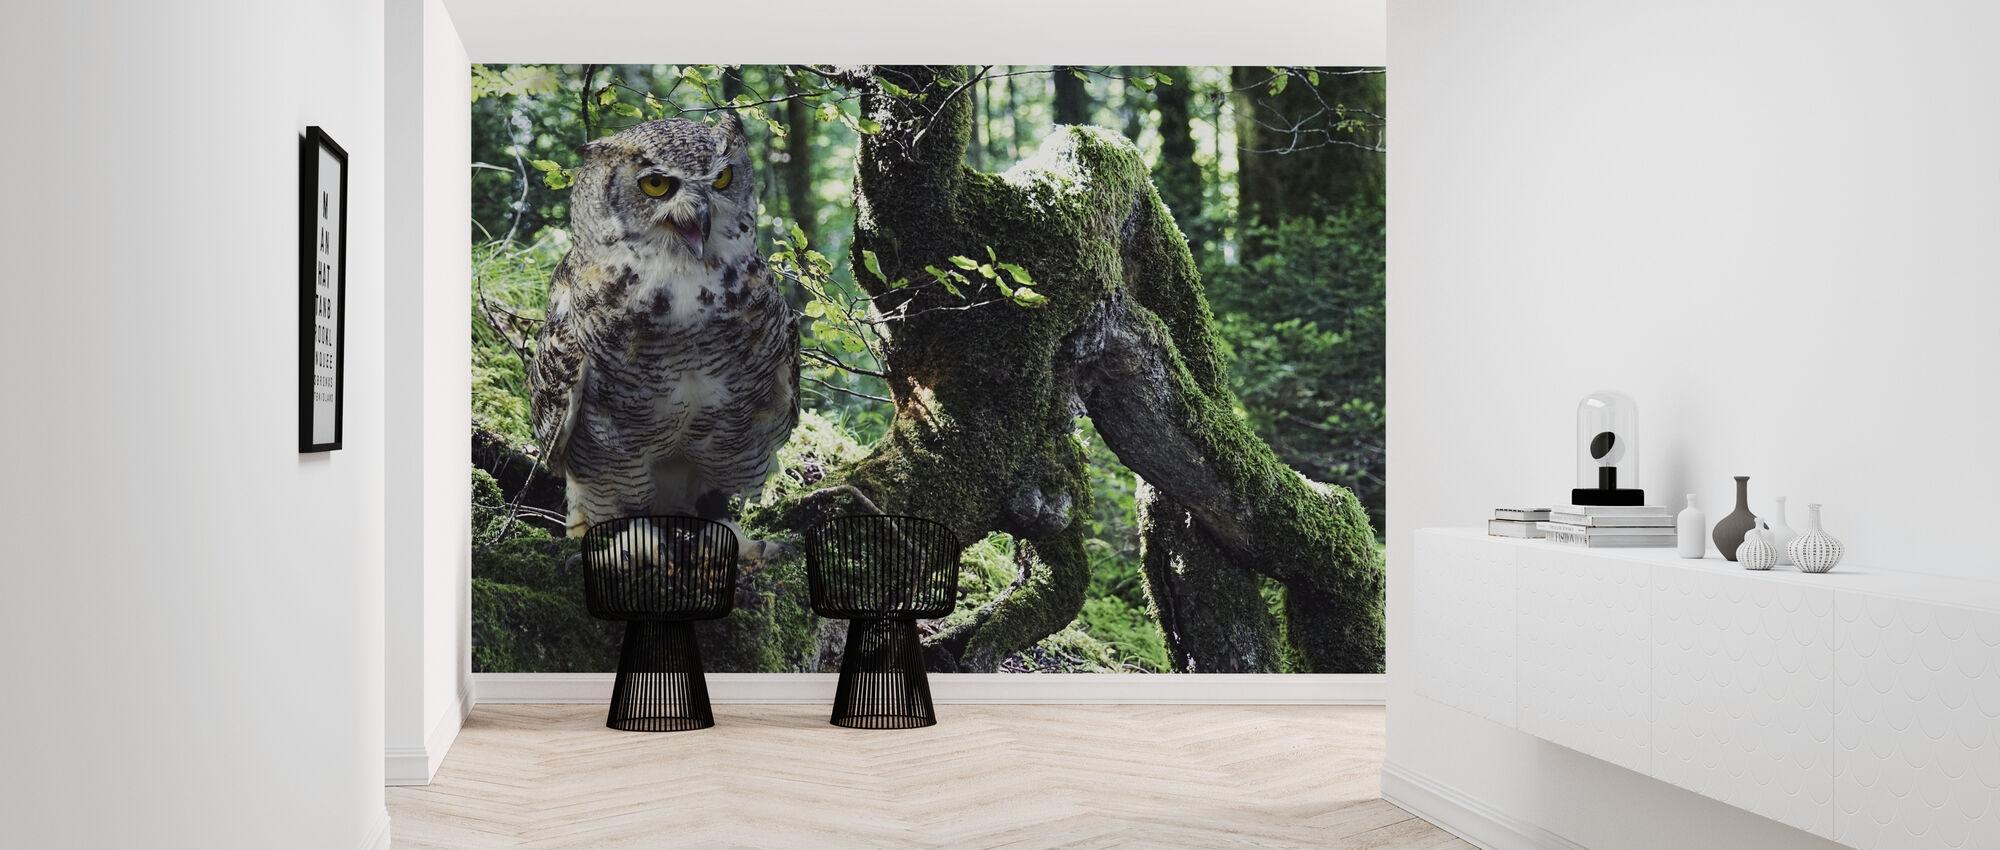 Young Eagle Owl - Wallpaper - Hallway